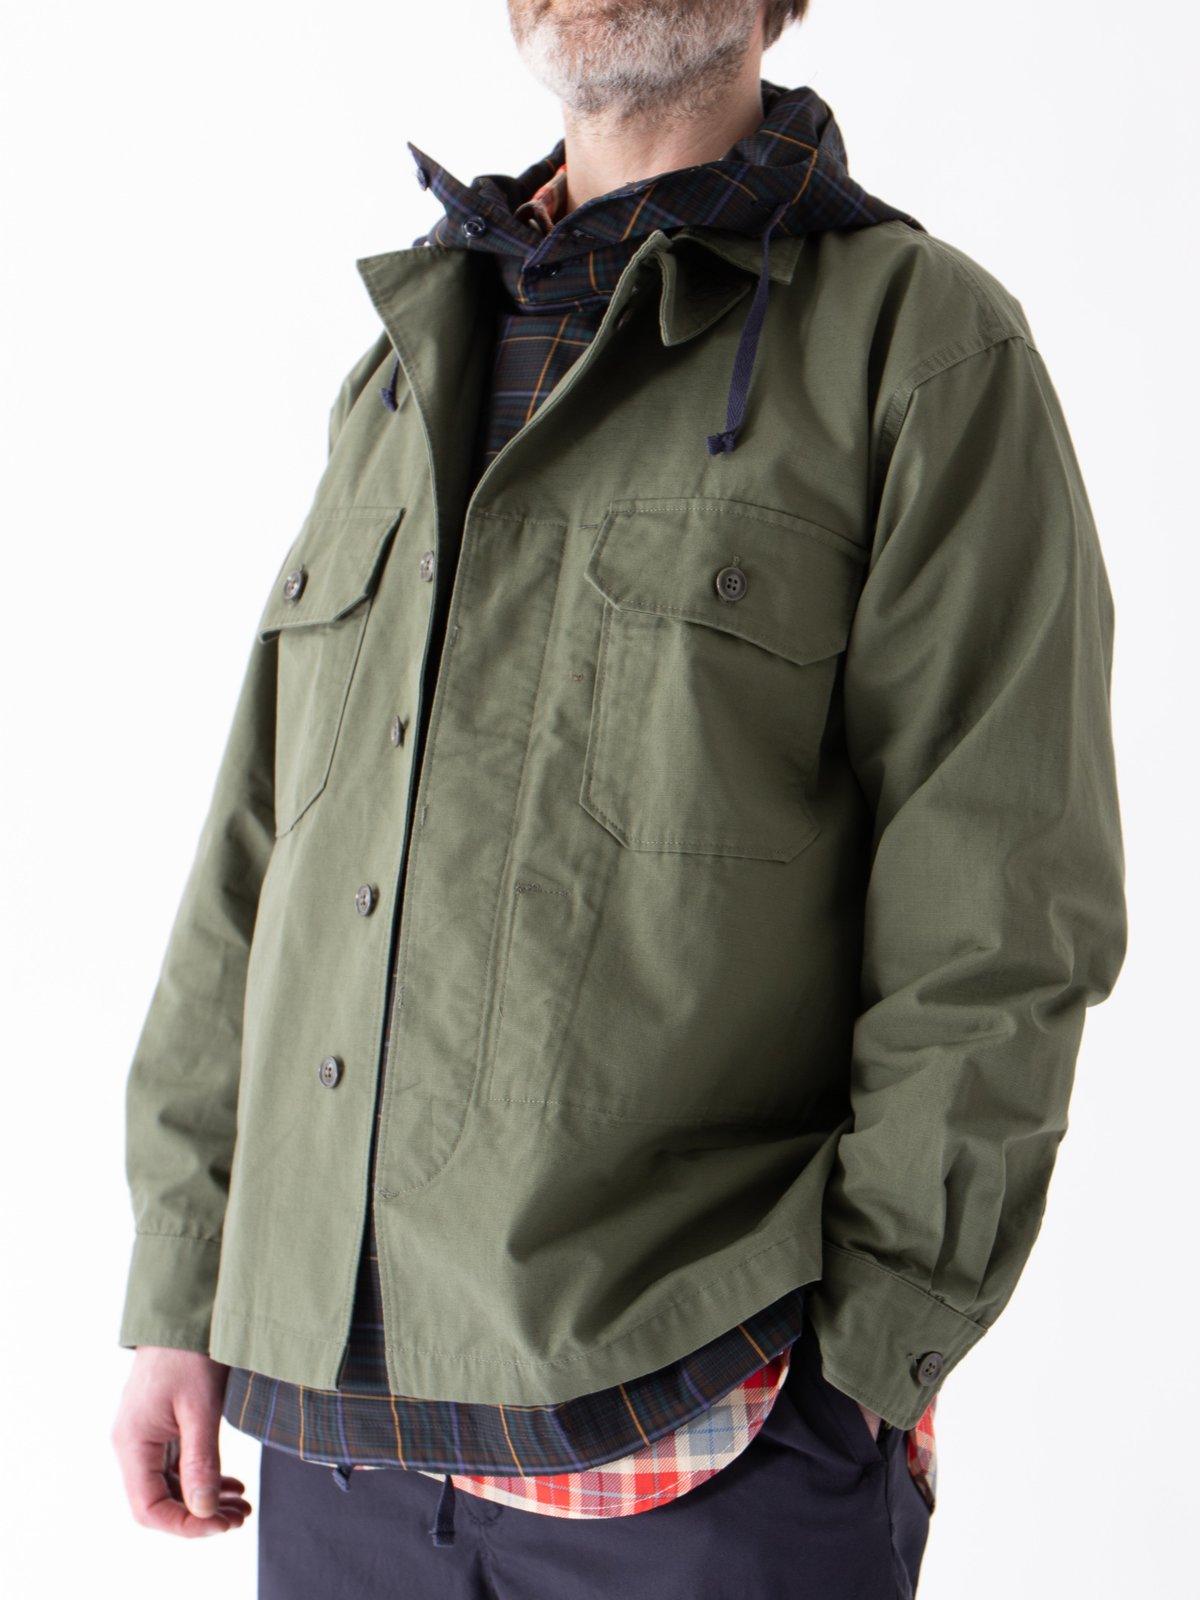 Olive Cotton Ripstop MC Shirt Jacket - Image 3